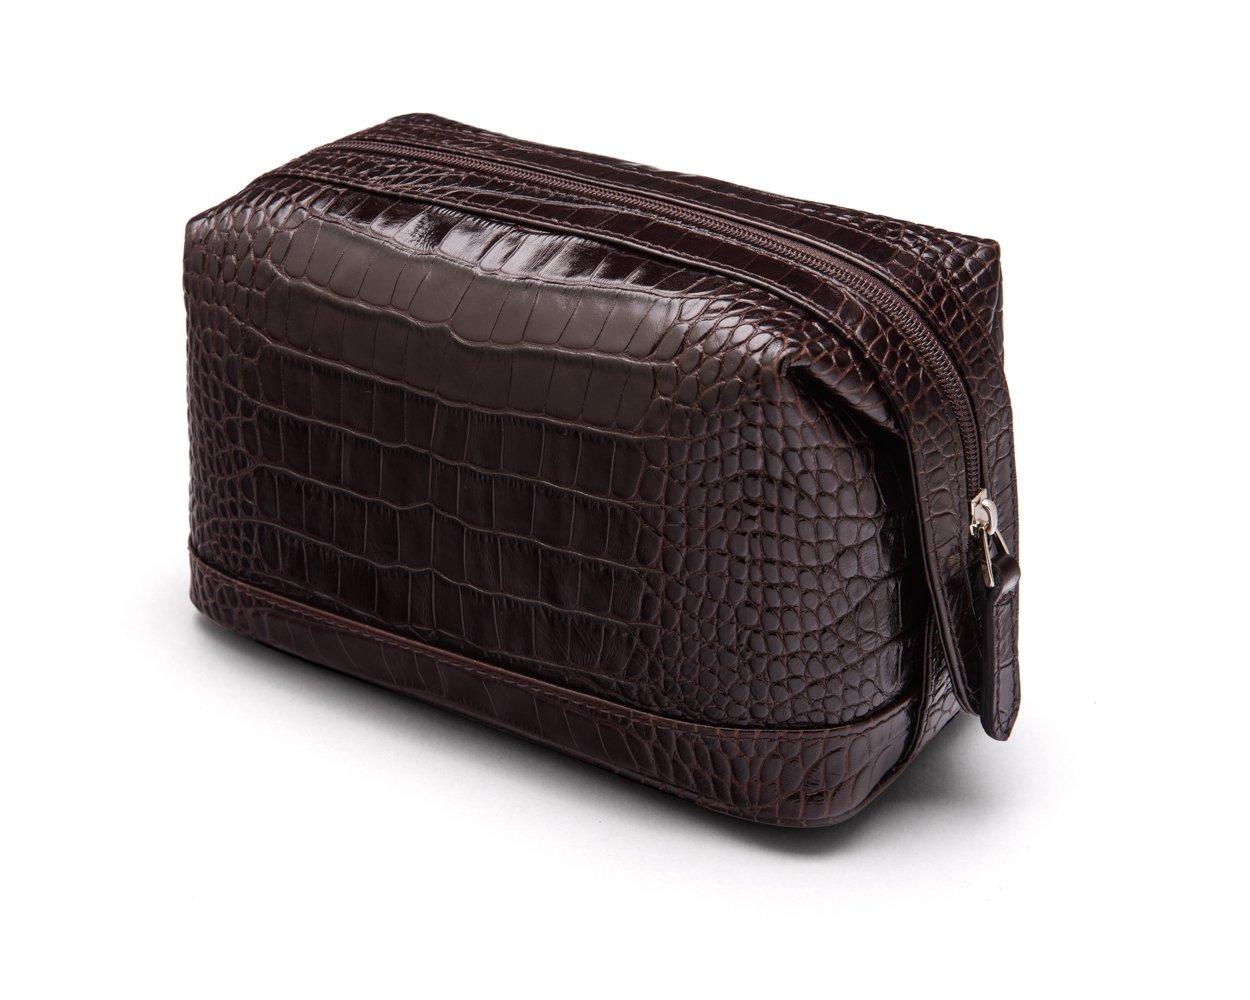 SAGEBROWN Brown Croc Compact Wash Bag